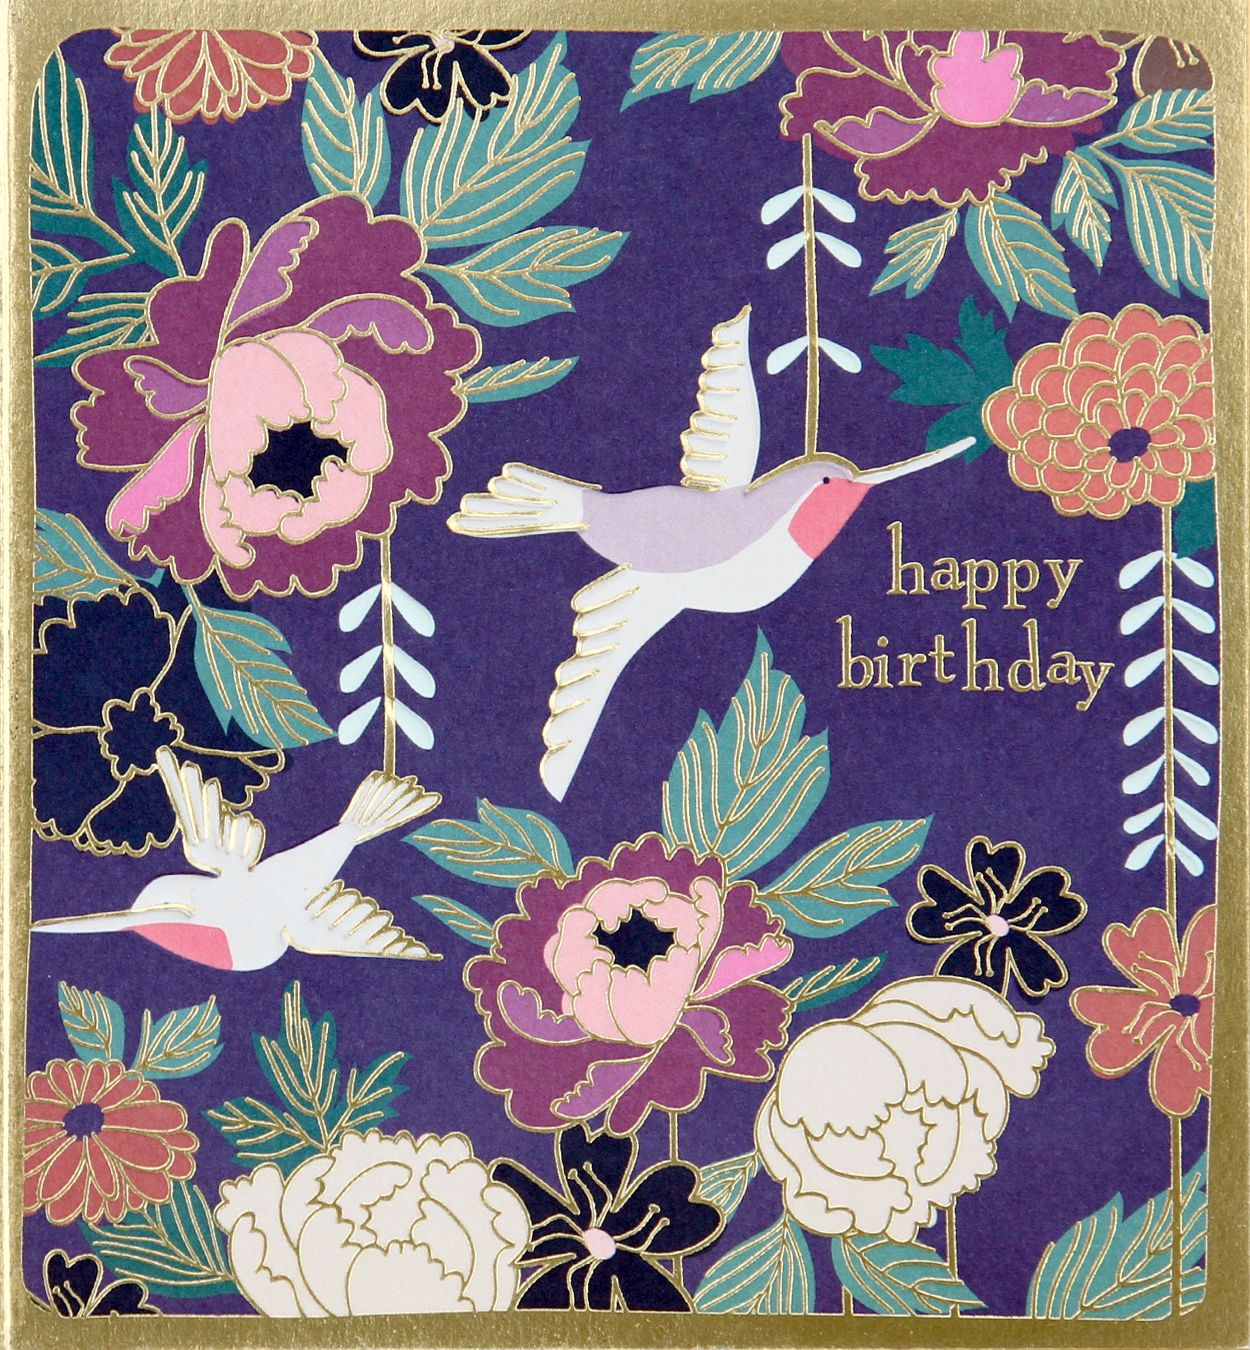 This Elegantly Detailed Kimono Happy Birthday Card Had A